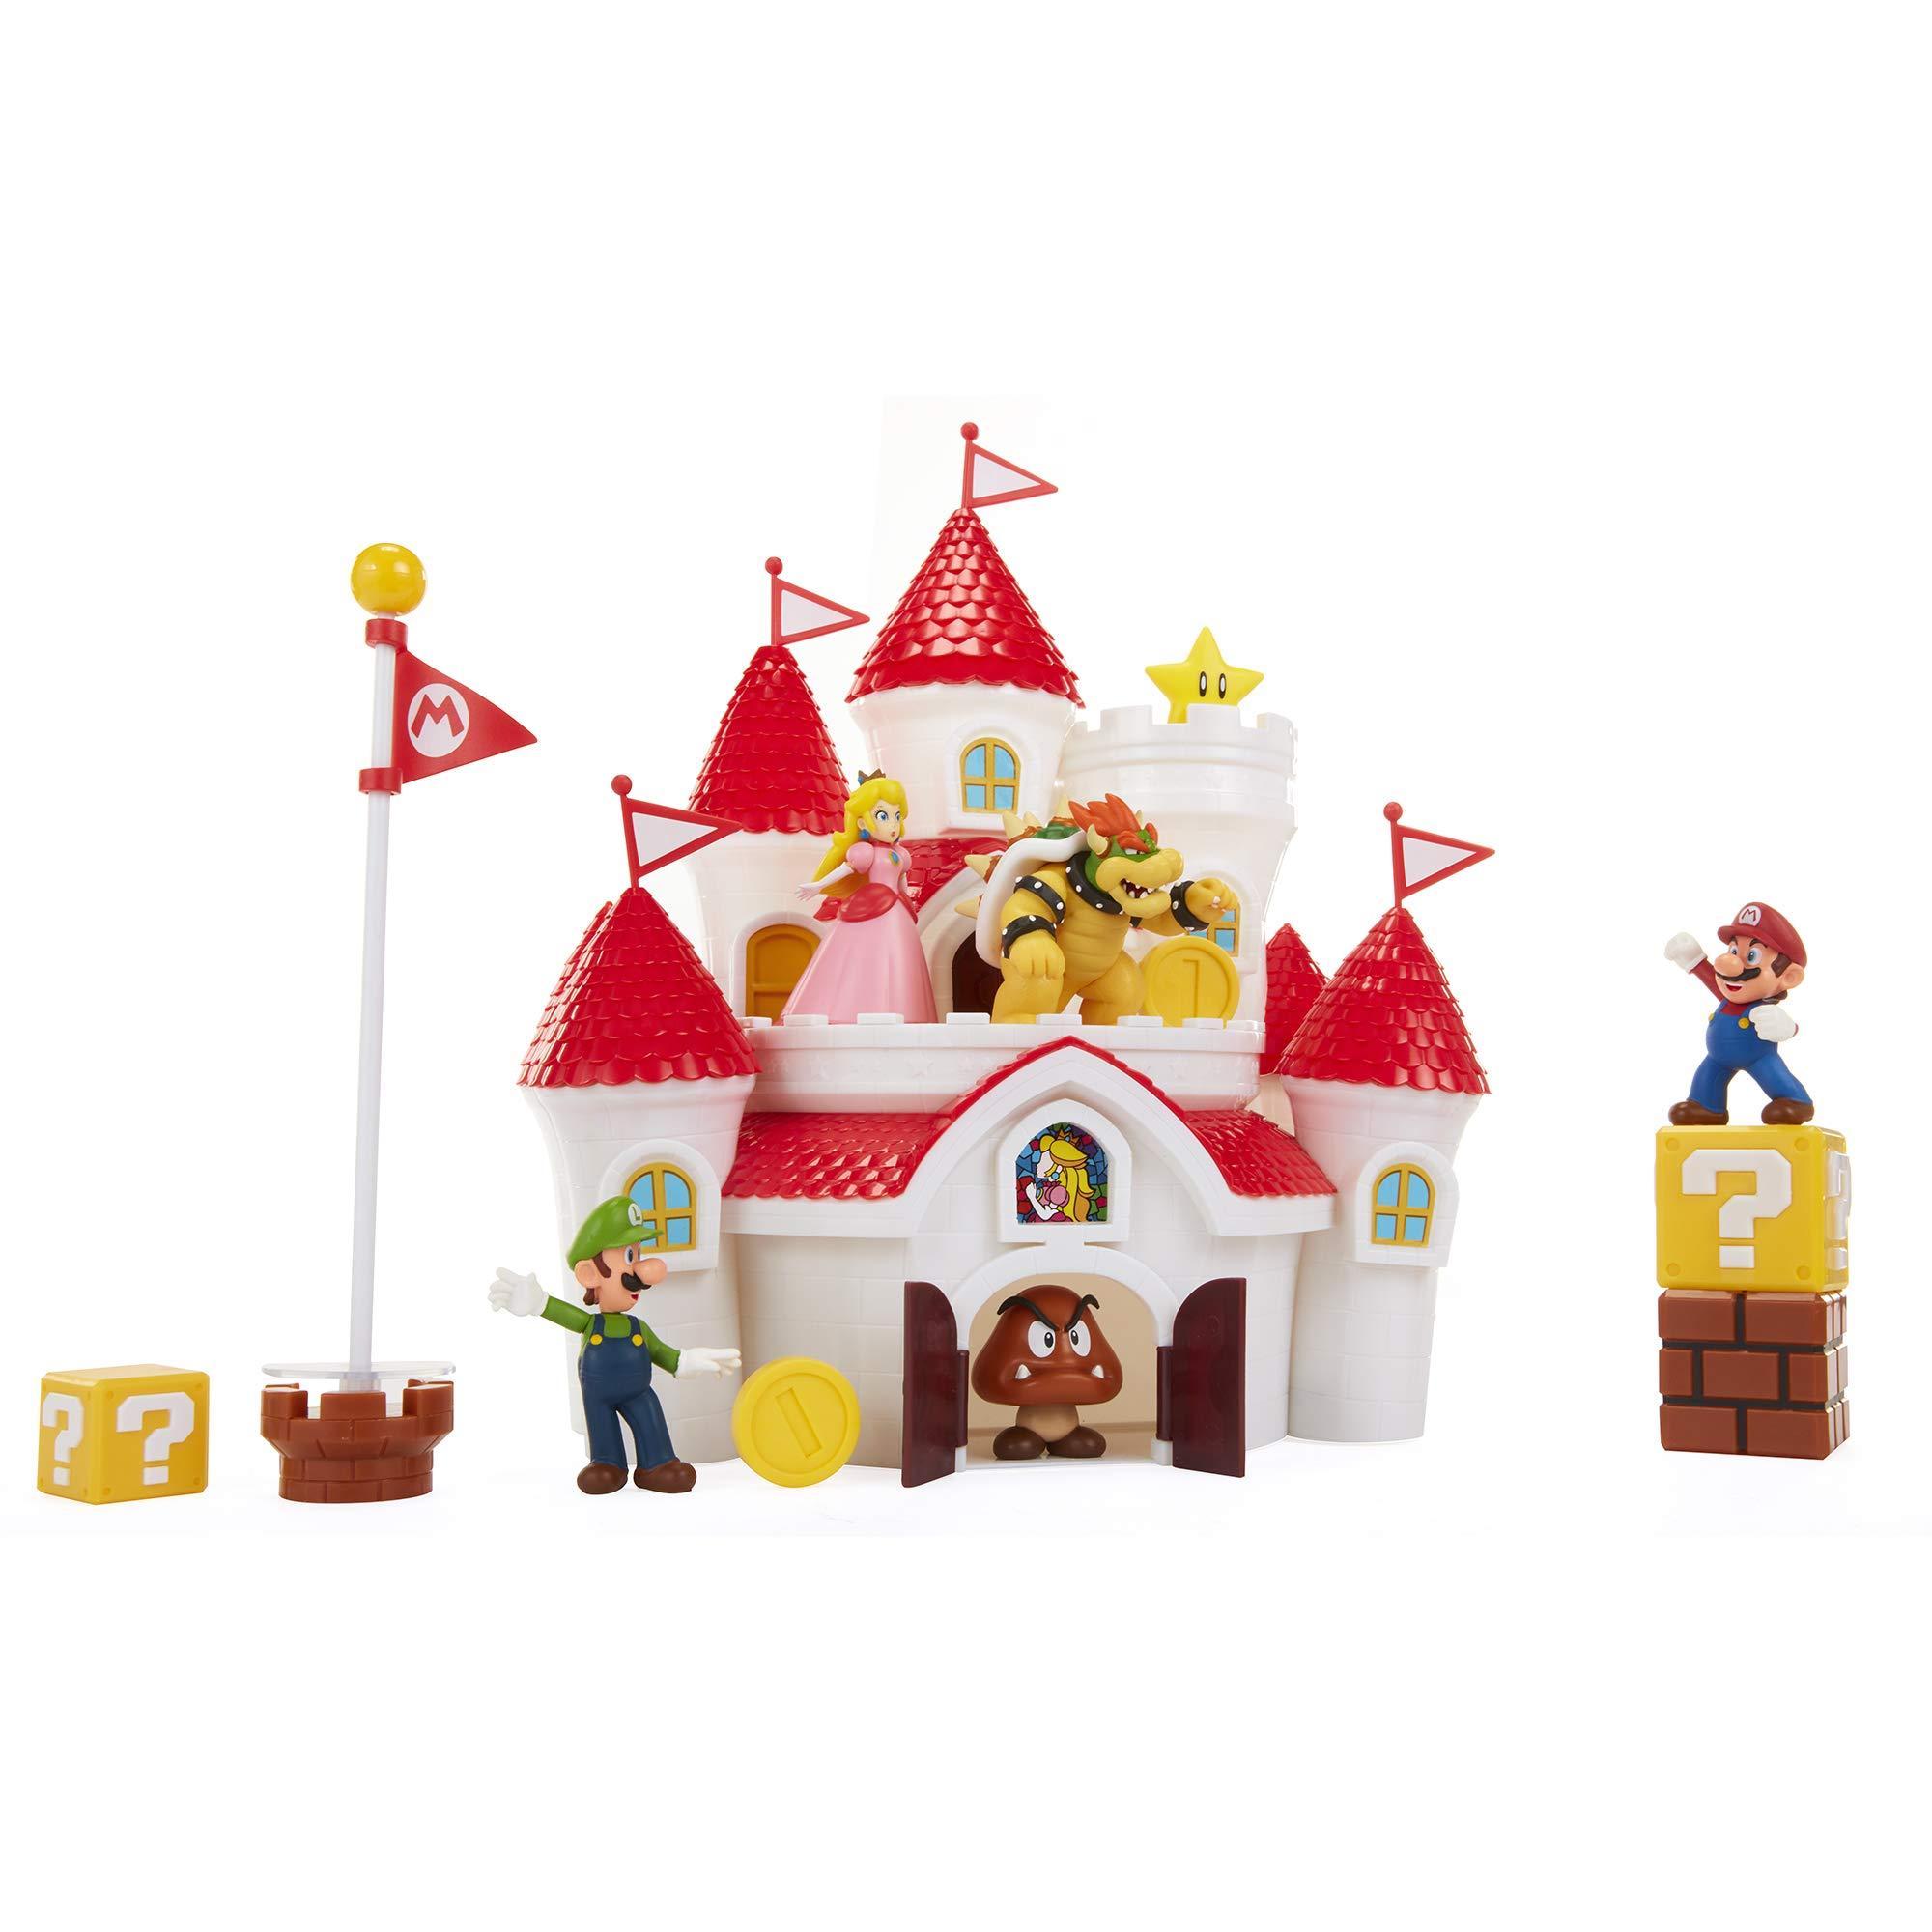 Nintendo Super Mario Deluxe Mushroom Kingdom Castle Playset with 5 Figures & 4 Accessories by Nintendo (Image #1)